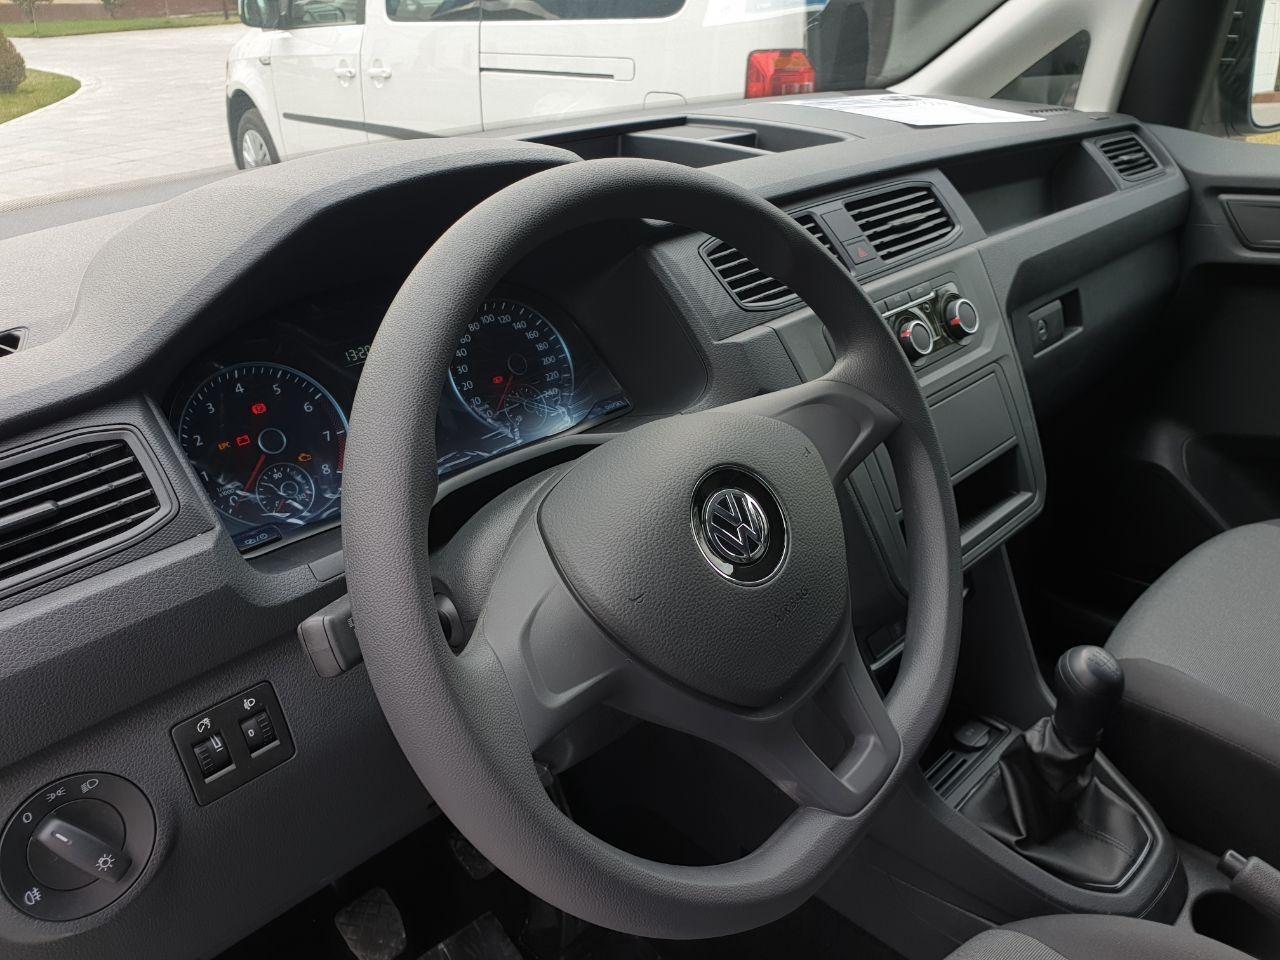 Volkswagen Caddy Narxi - Цена на Кэдди в Узбекистане - 9